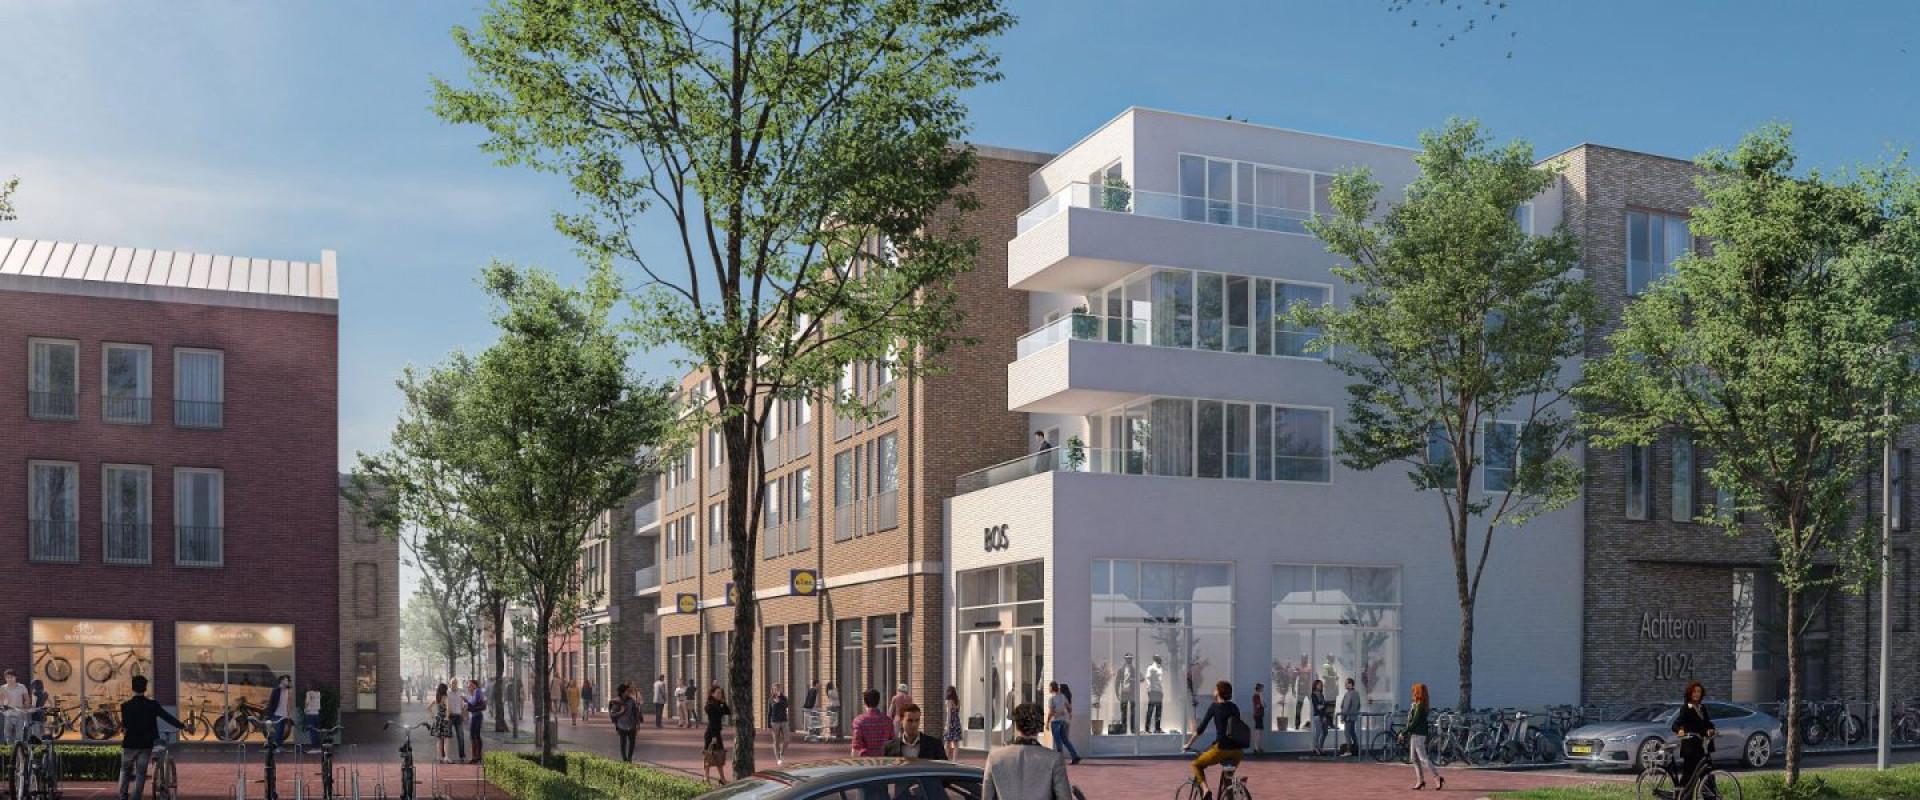 Waaijer-Impressie-Berkel-Centrum-West-4-1440x600